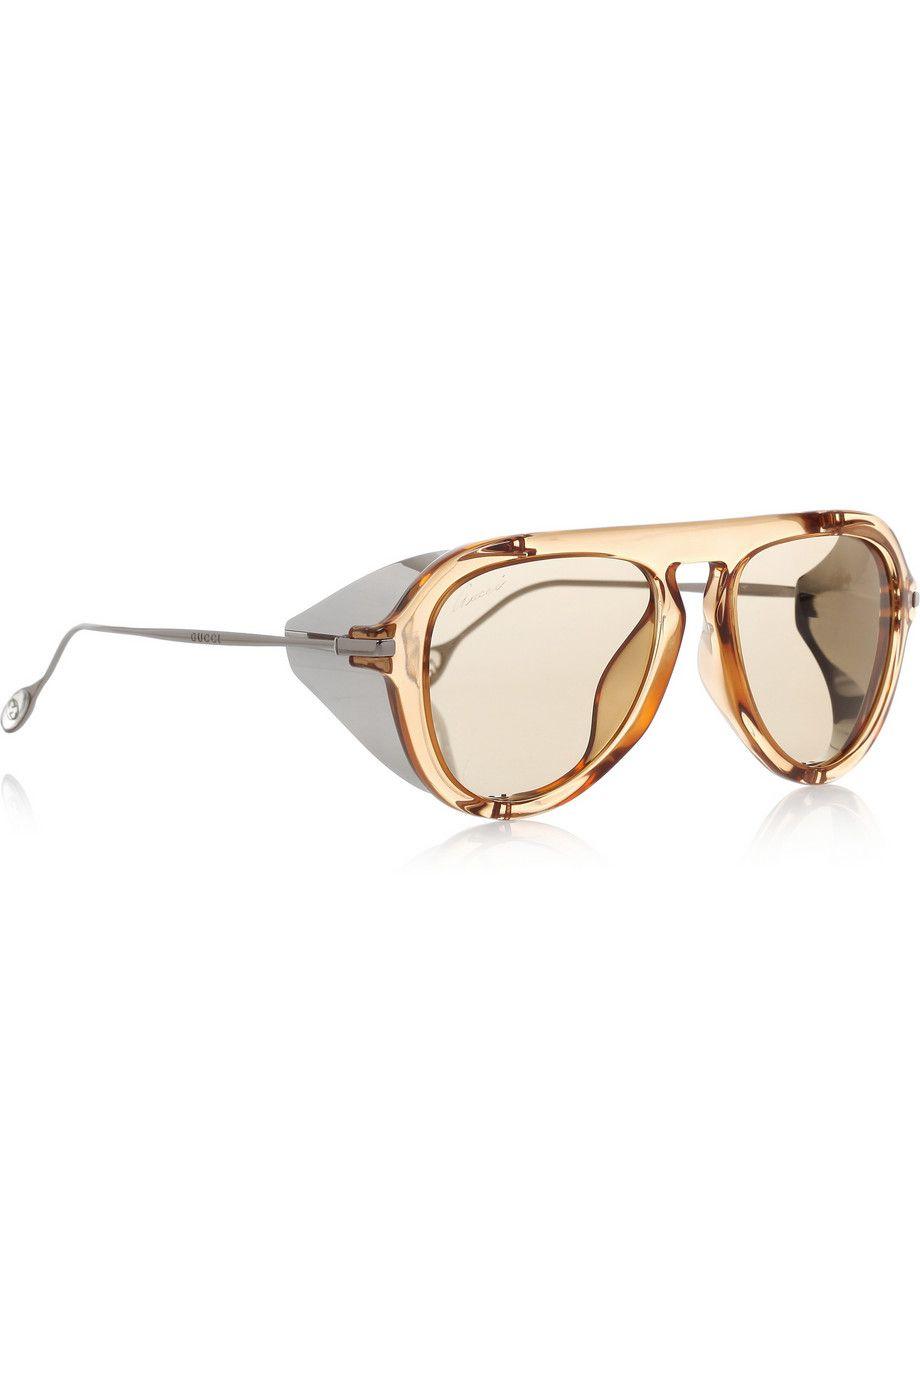 0f9b65fb8e8 Fashion Sunglasses on in 2019